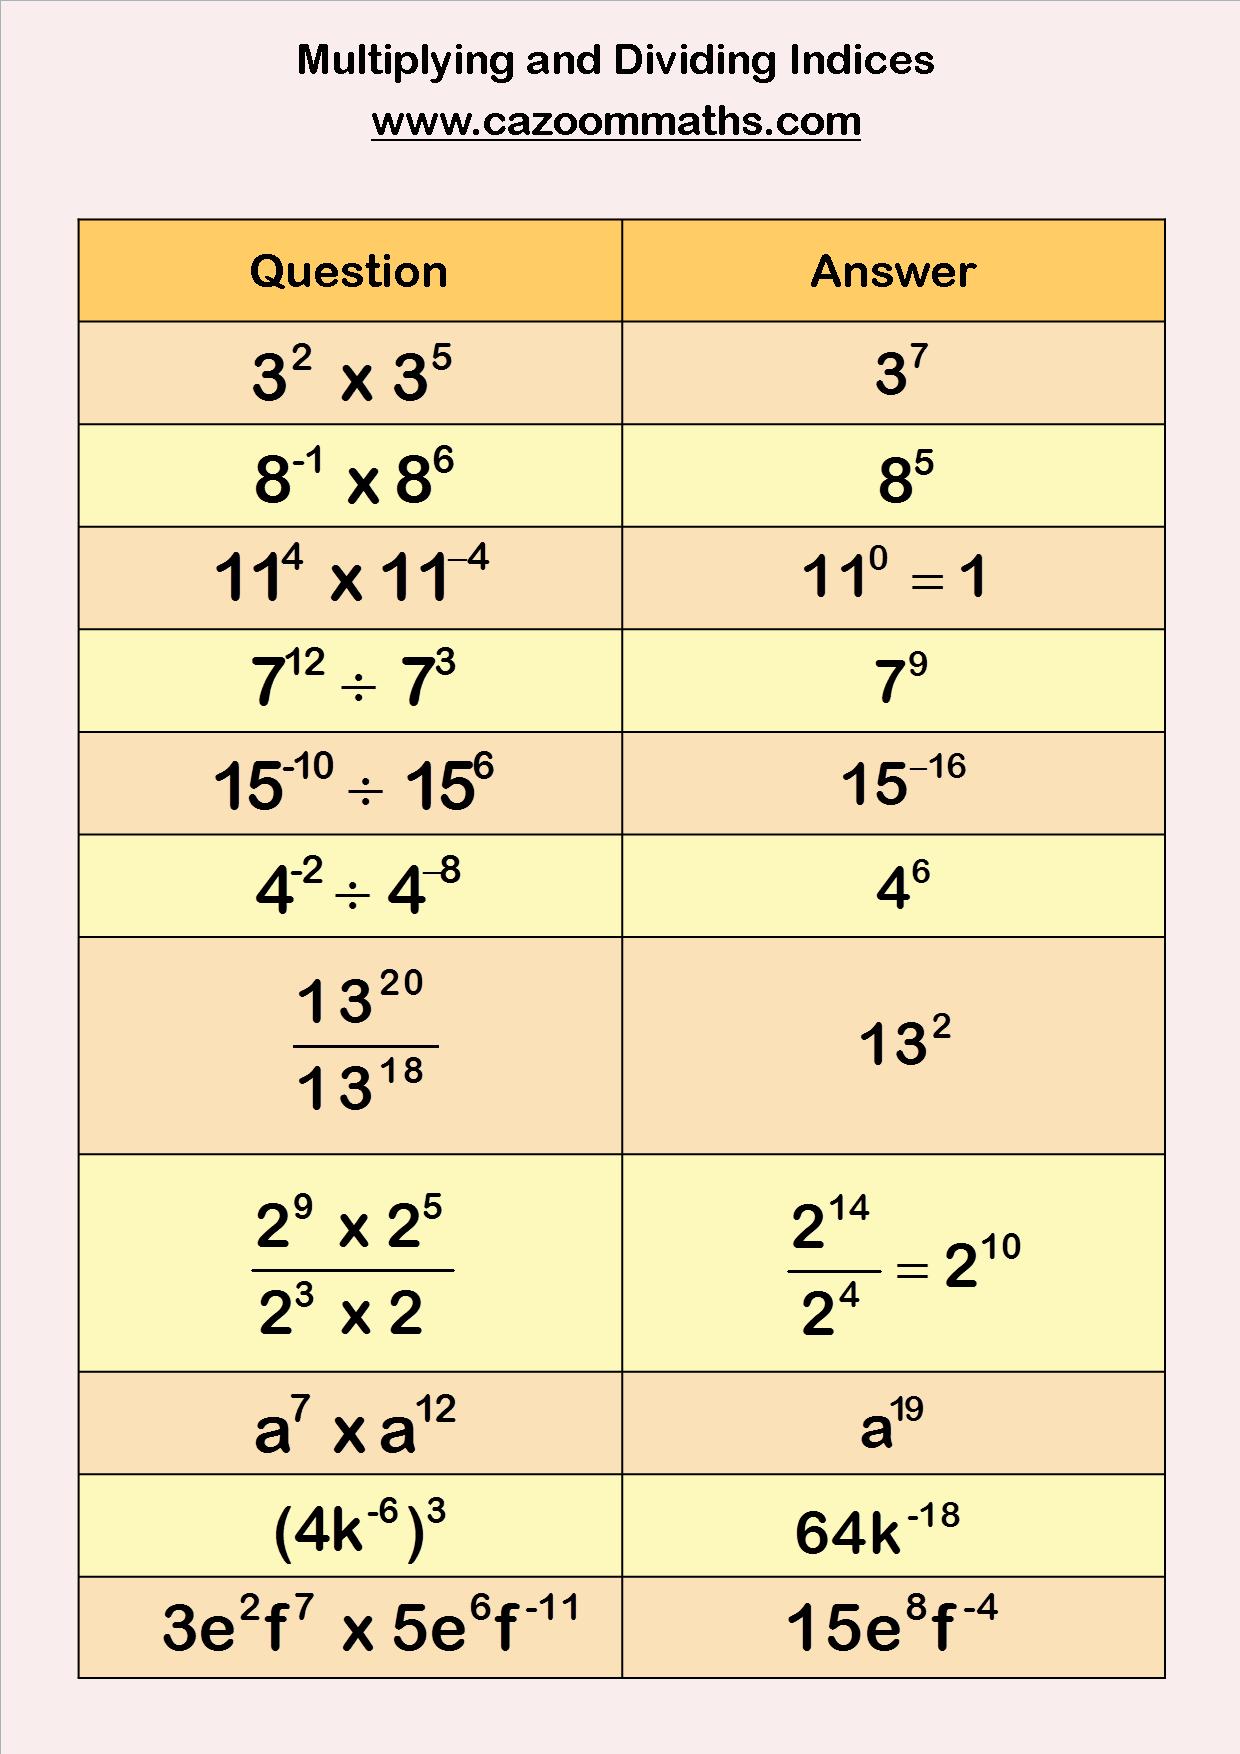 Fractional Indices Worksheet